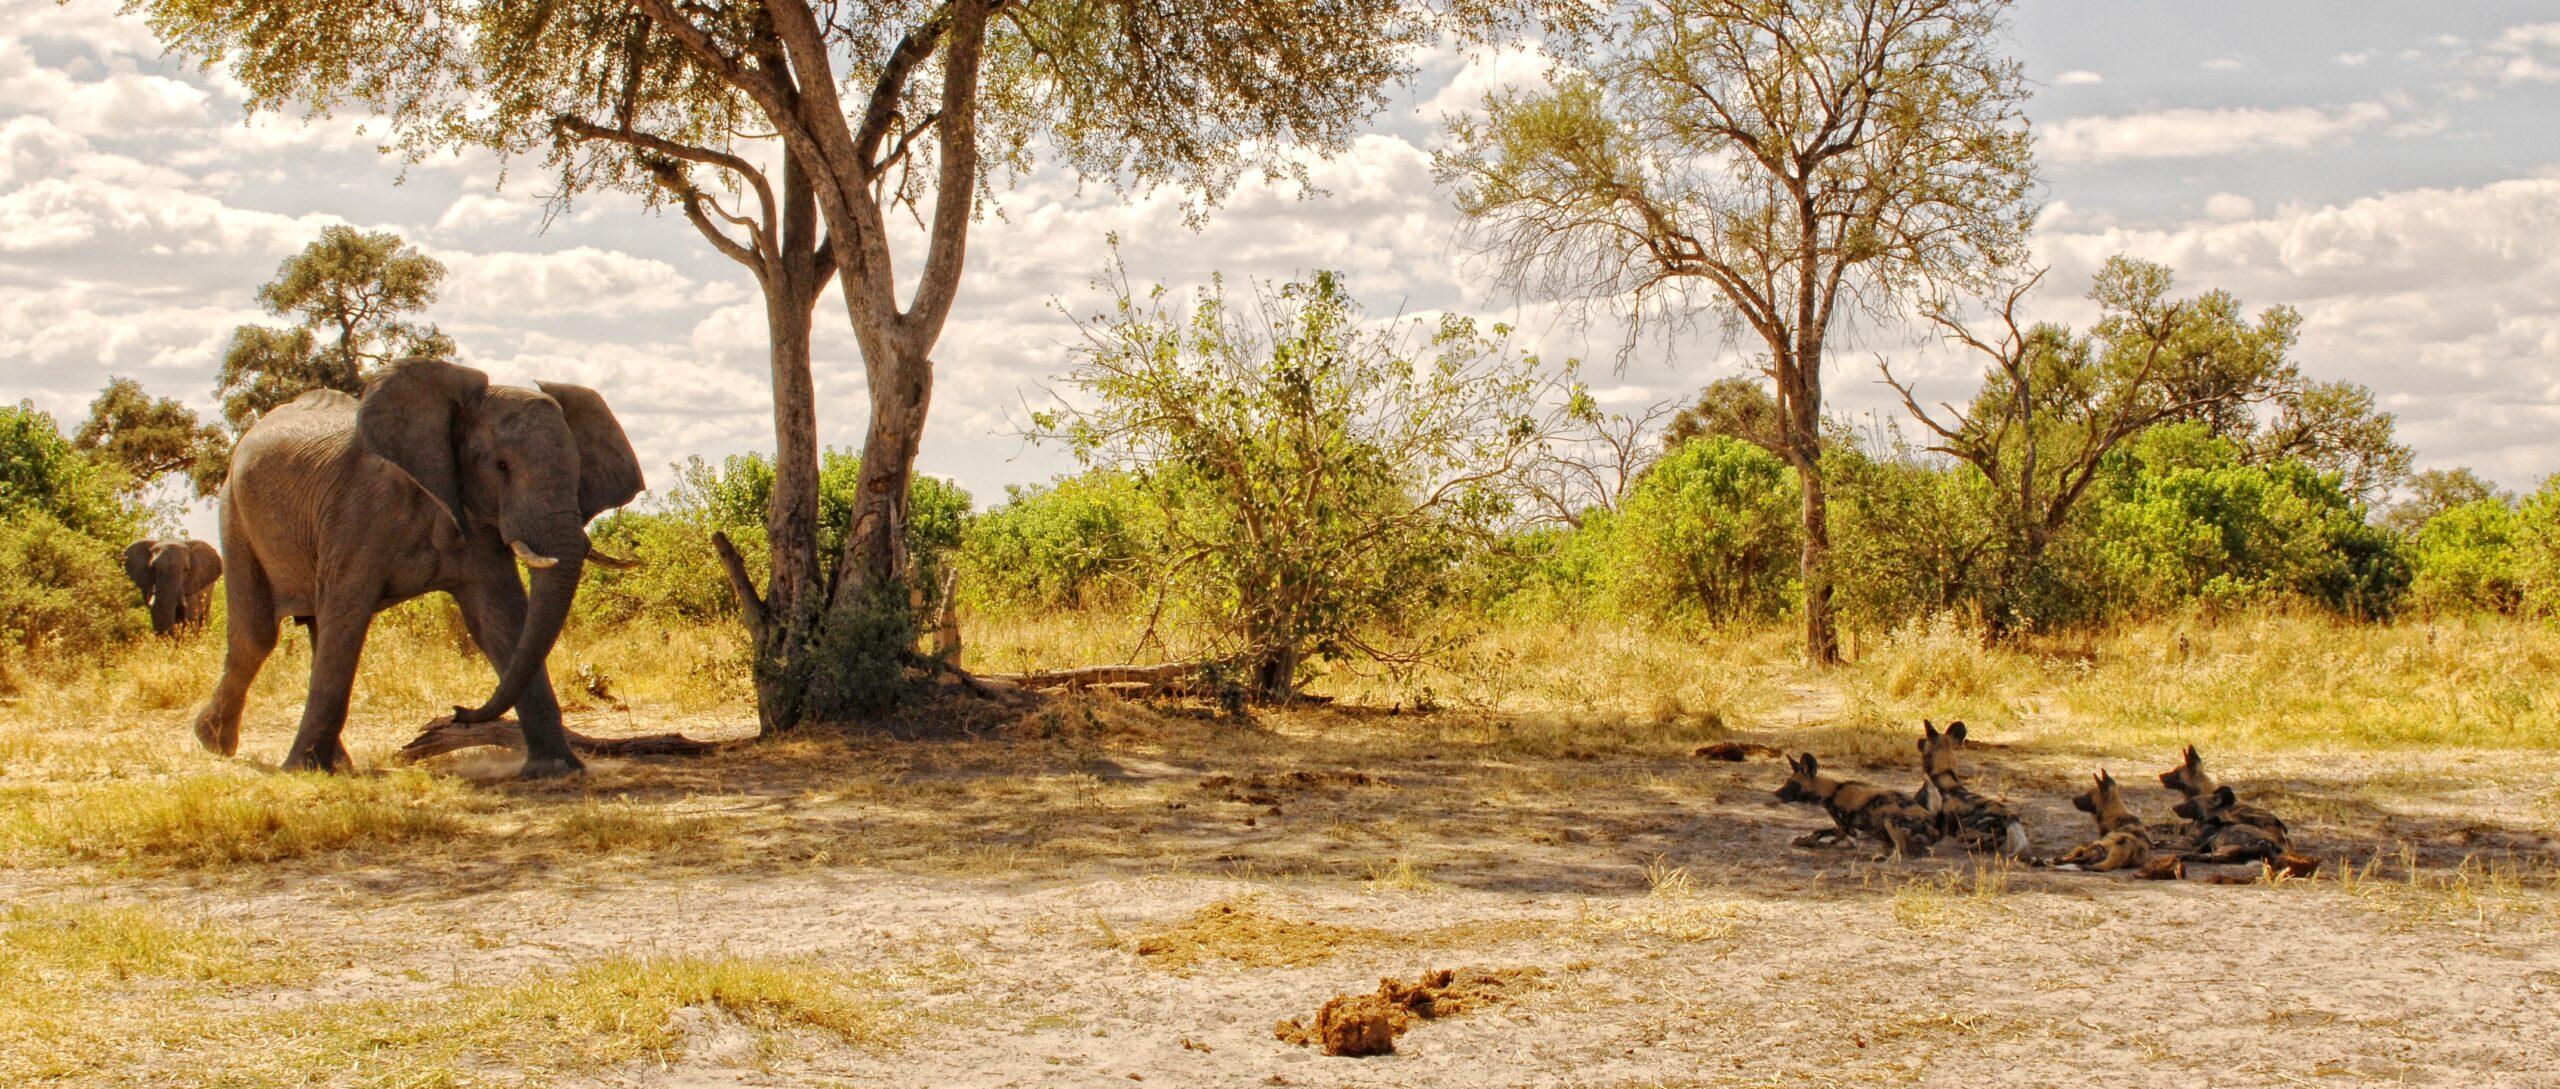 elephant and wild dog beneath trees in botswana